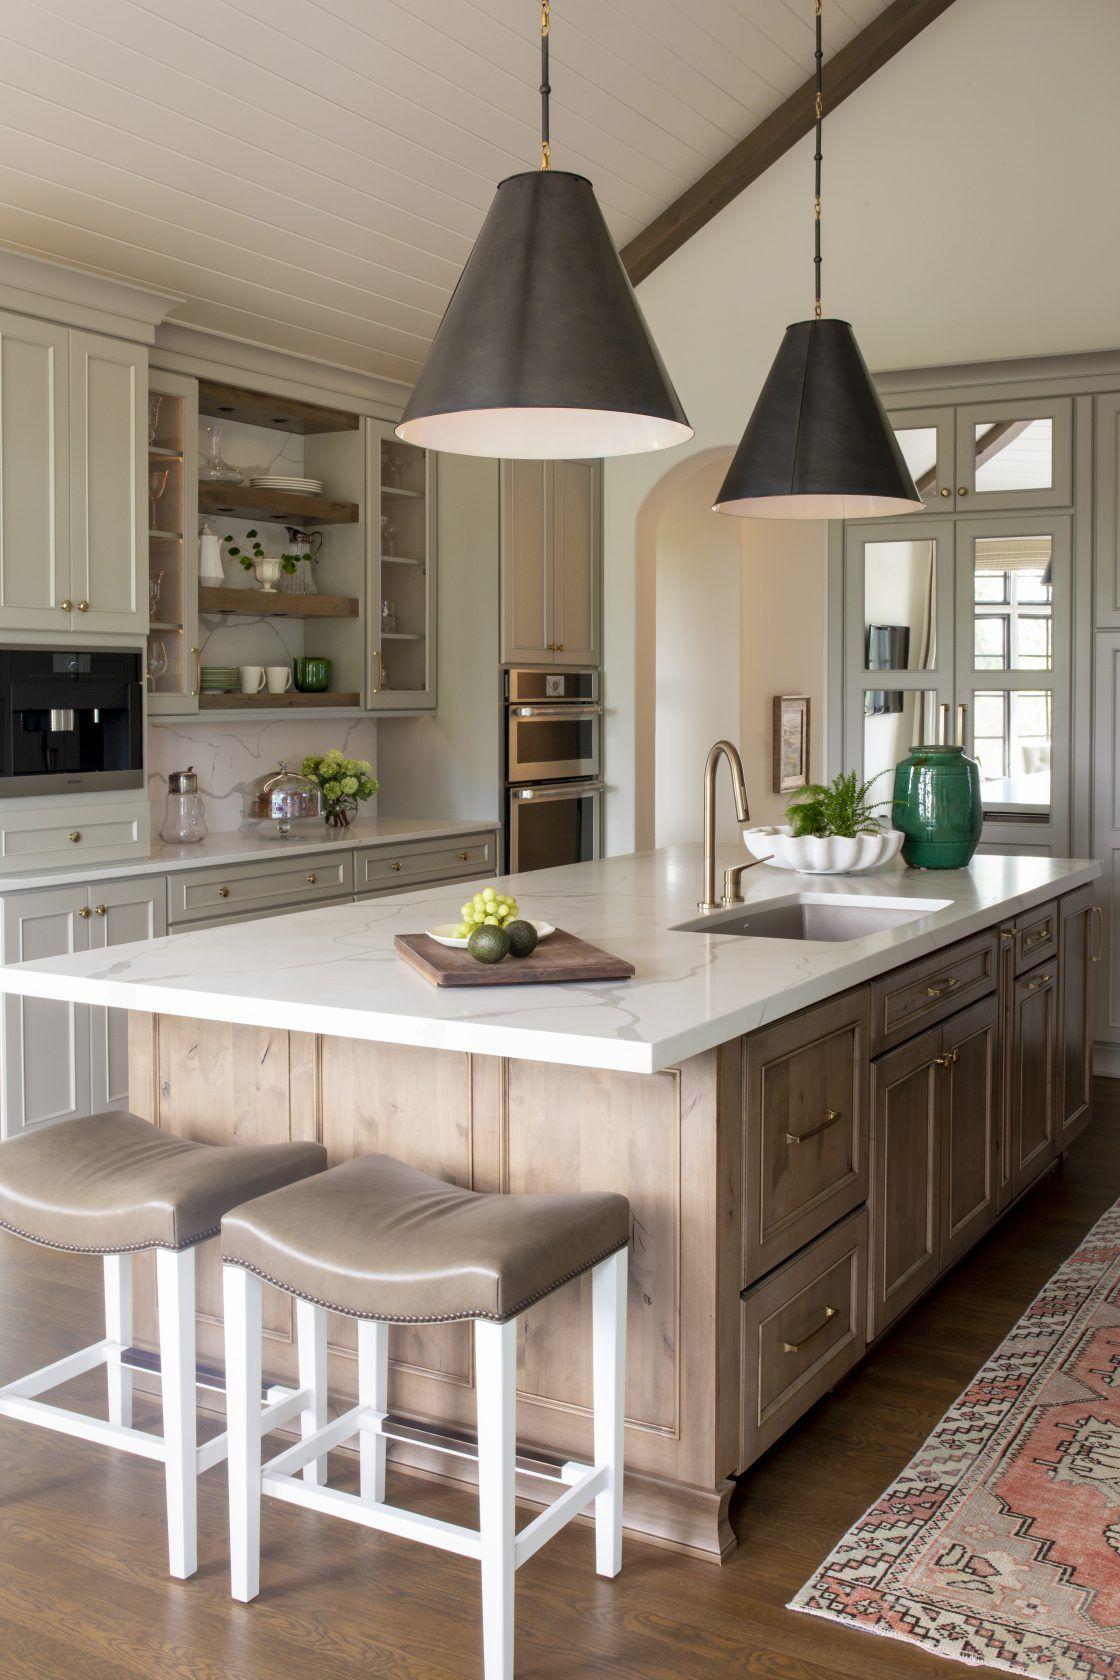 White Wood Kitchen Cabinets Design Adorable European Inspired Remodel R Cartwright Design Kitchen 6464 2